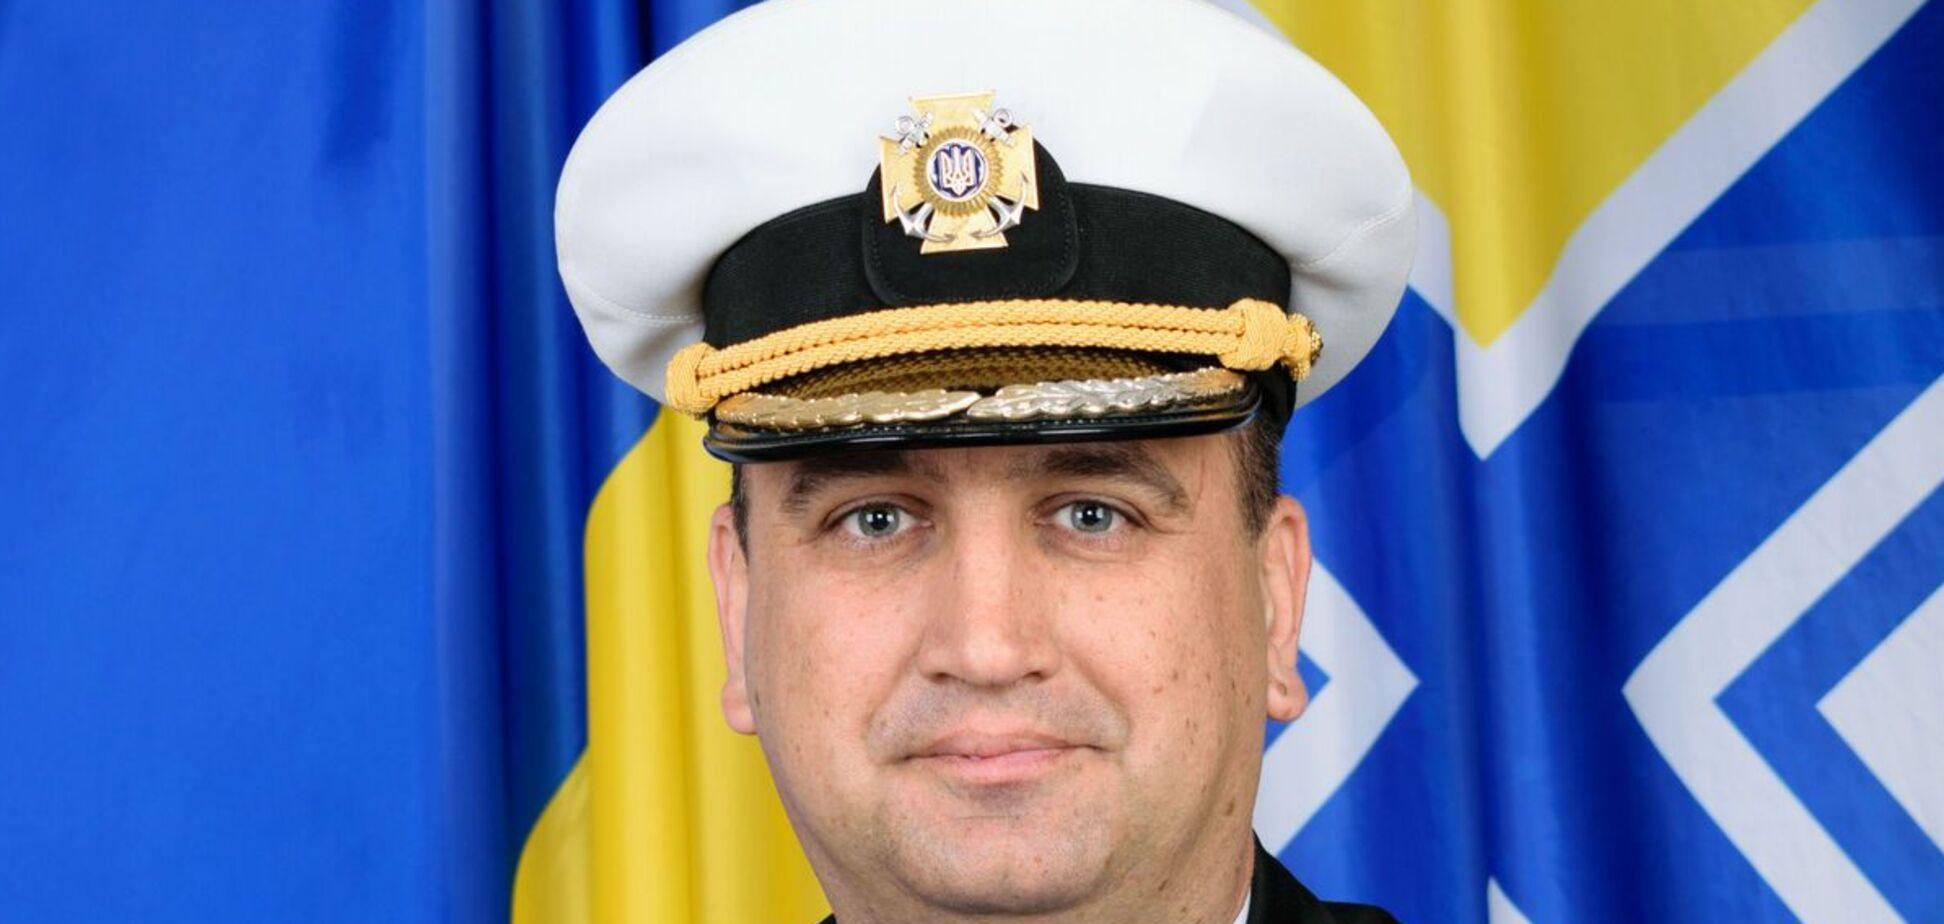 Командующий ВМС ВСУ Алексей Неижпапа